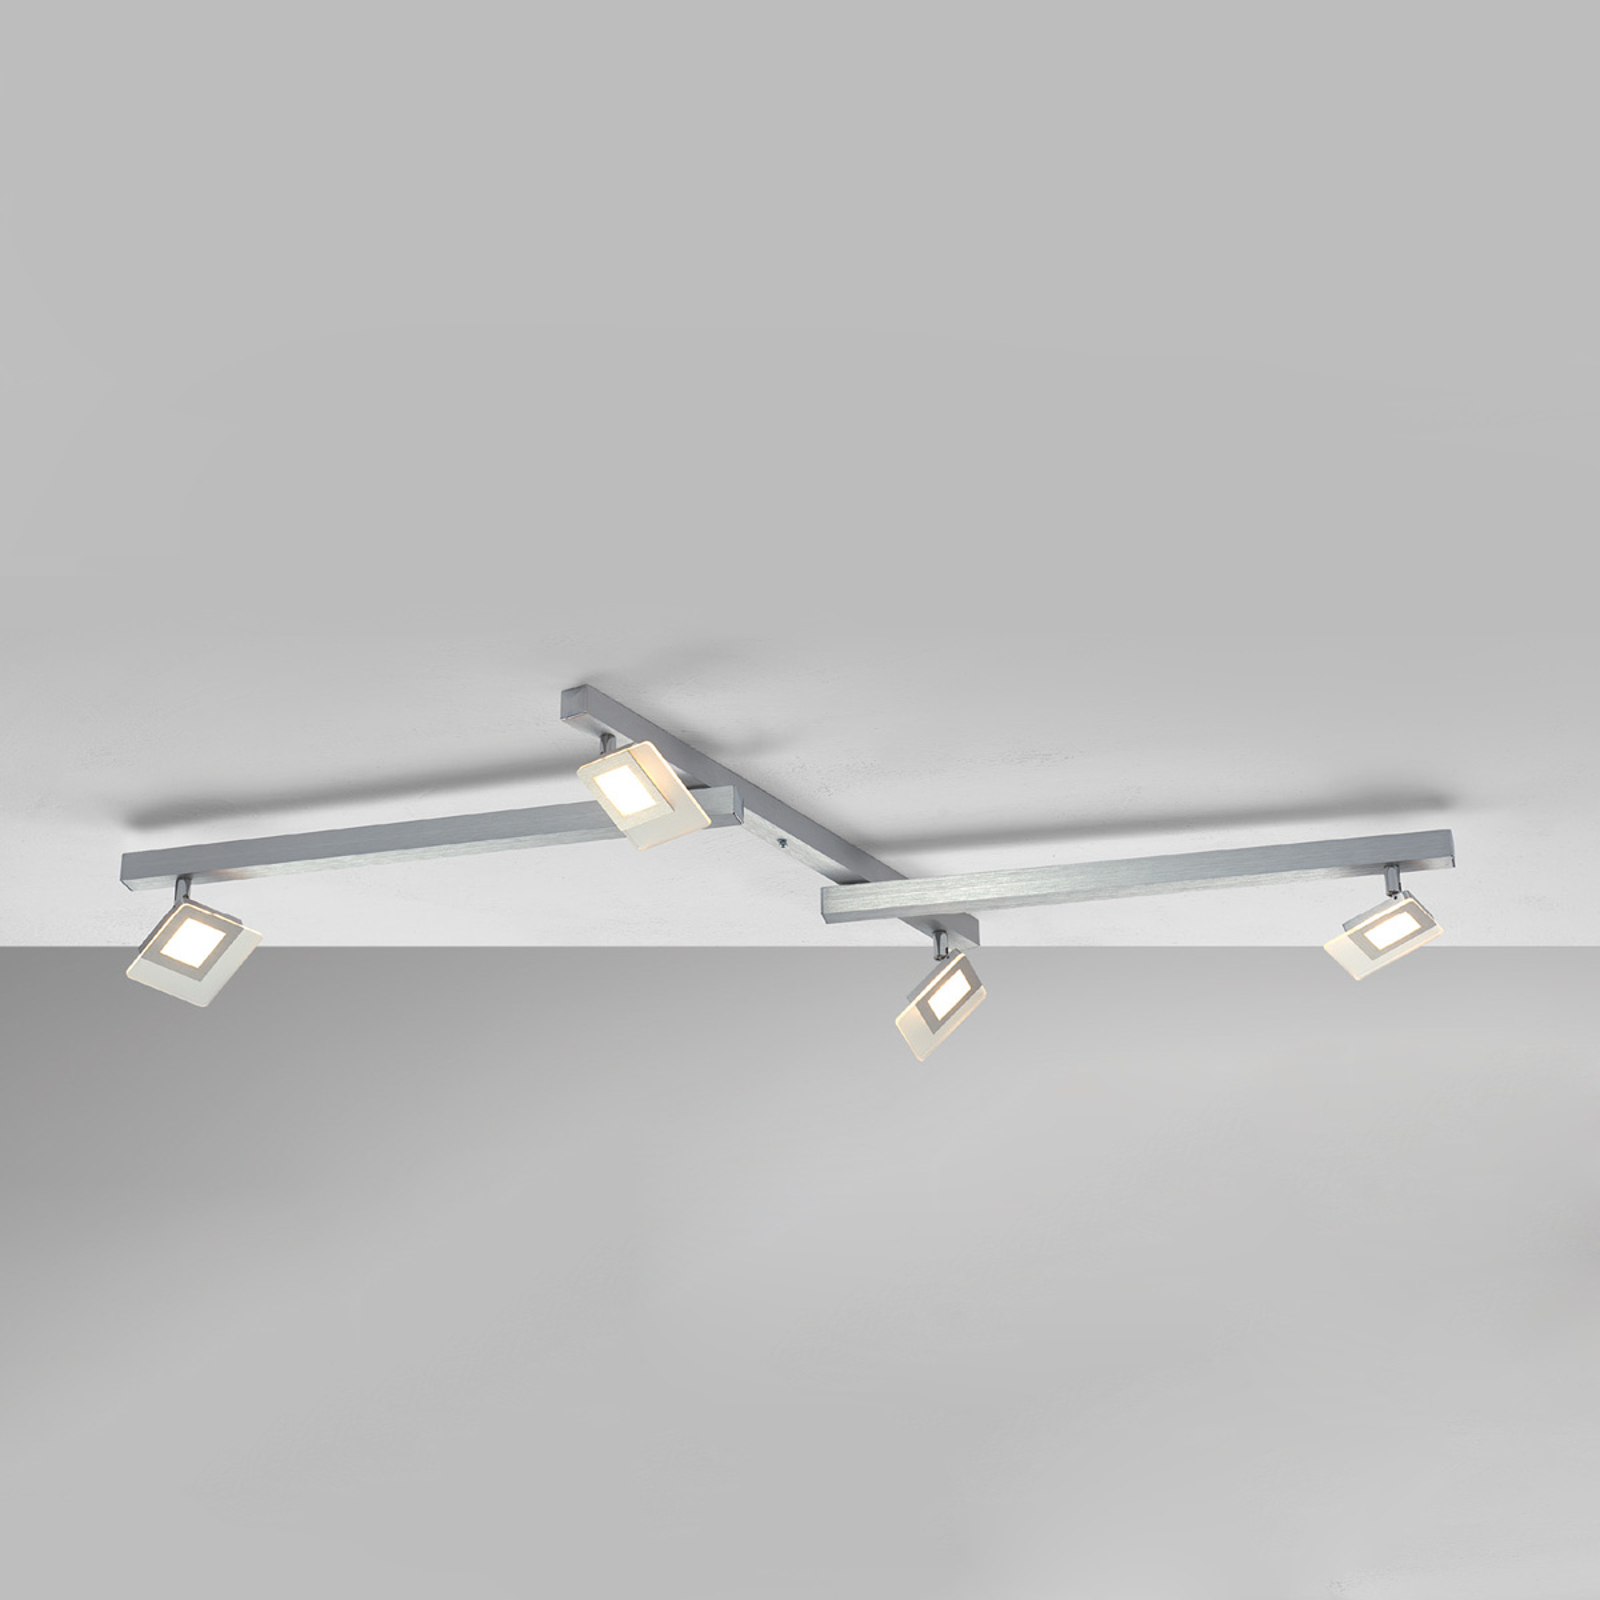 Eksklusiv LED-taklampe Line, 4 lys